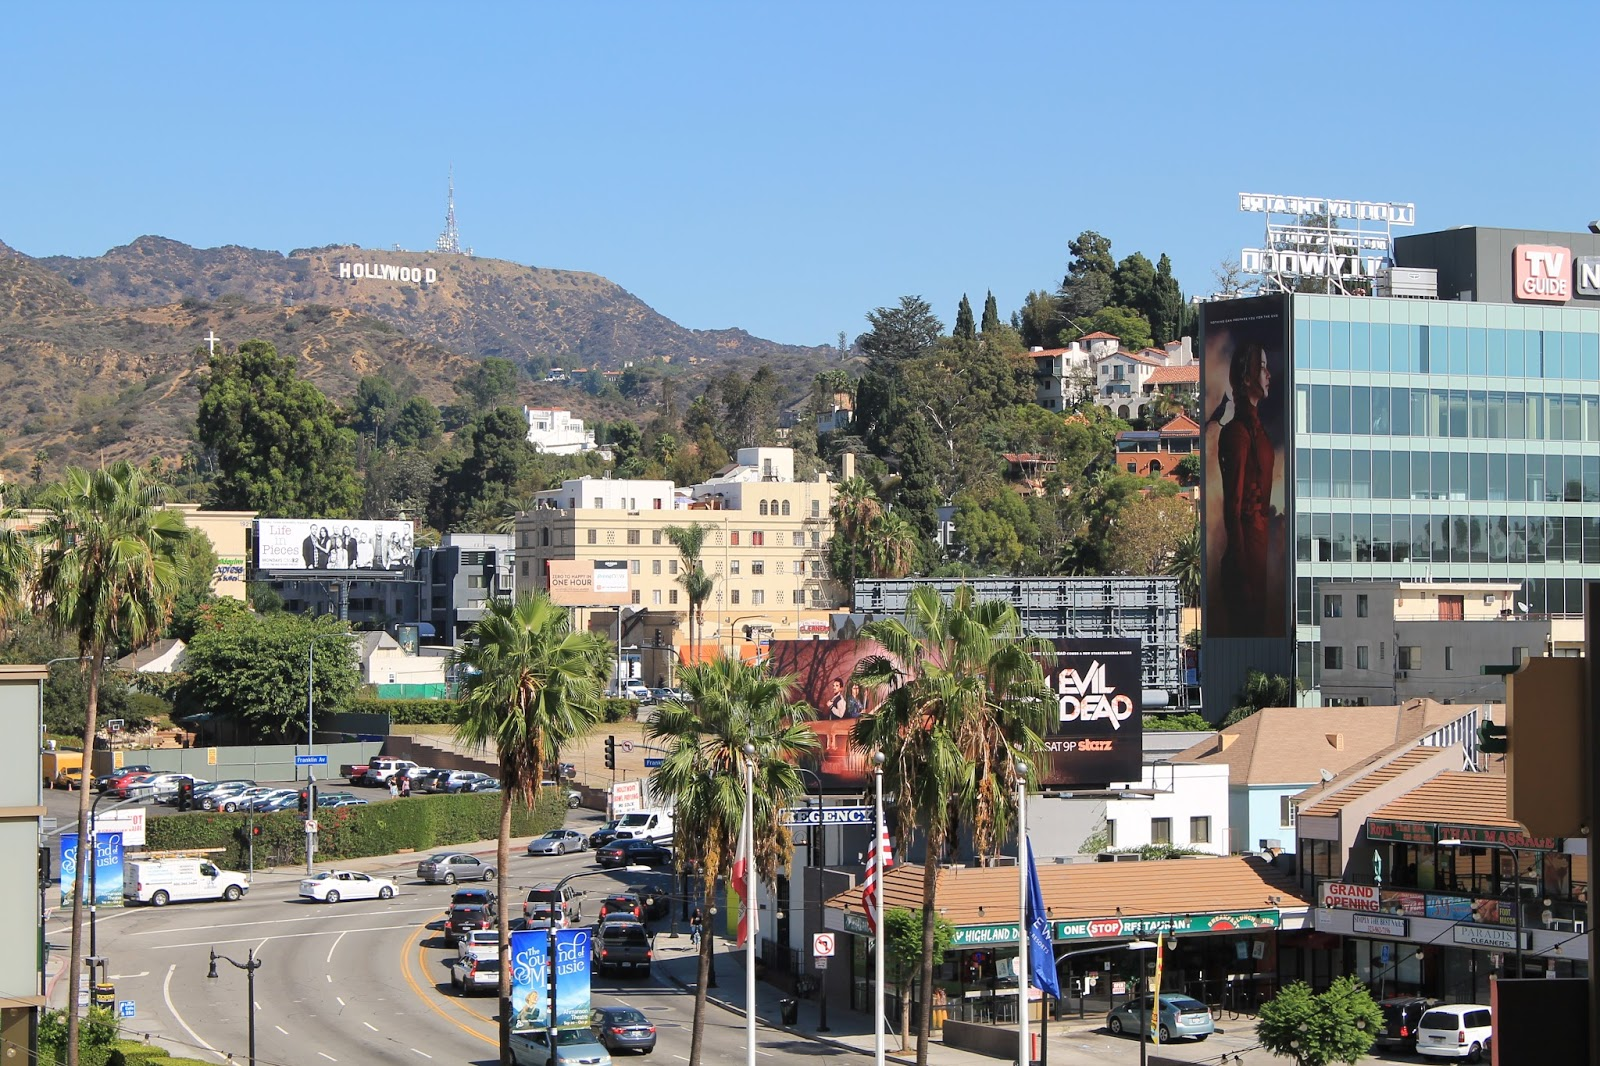 vacances-a-hollywood-usa